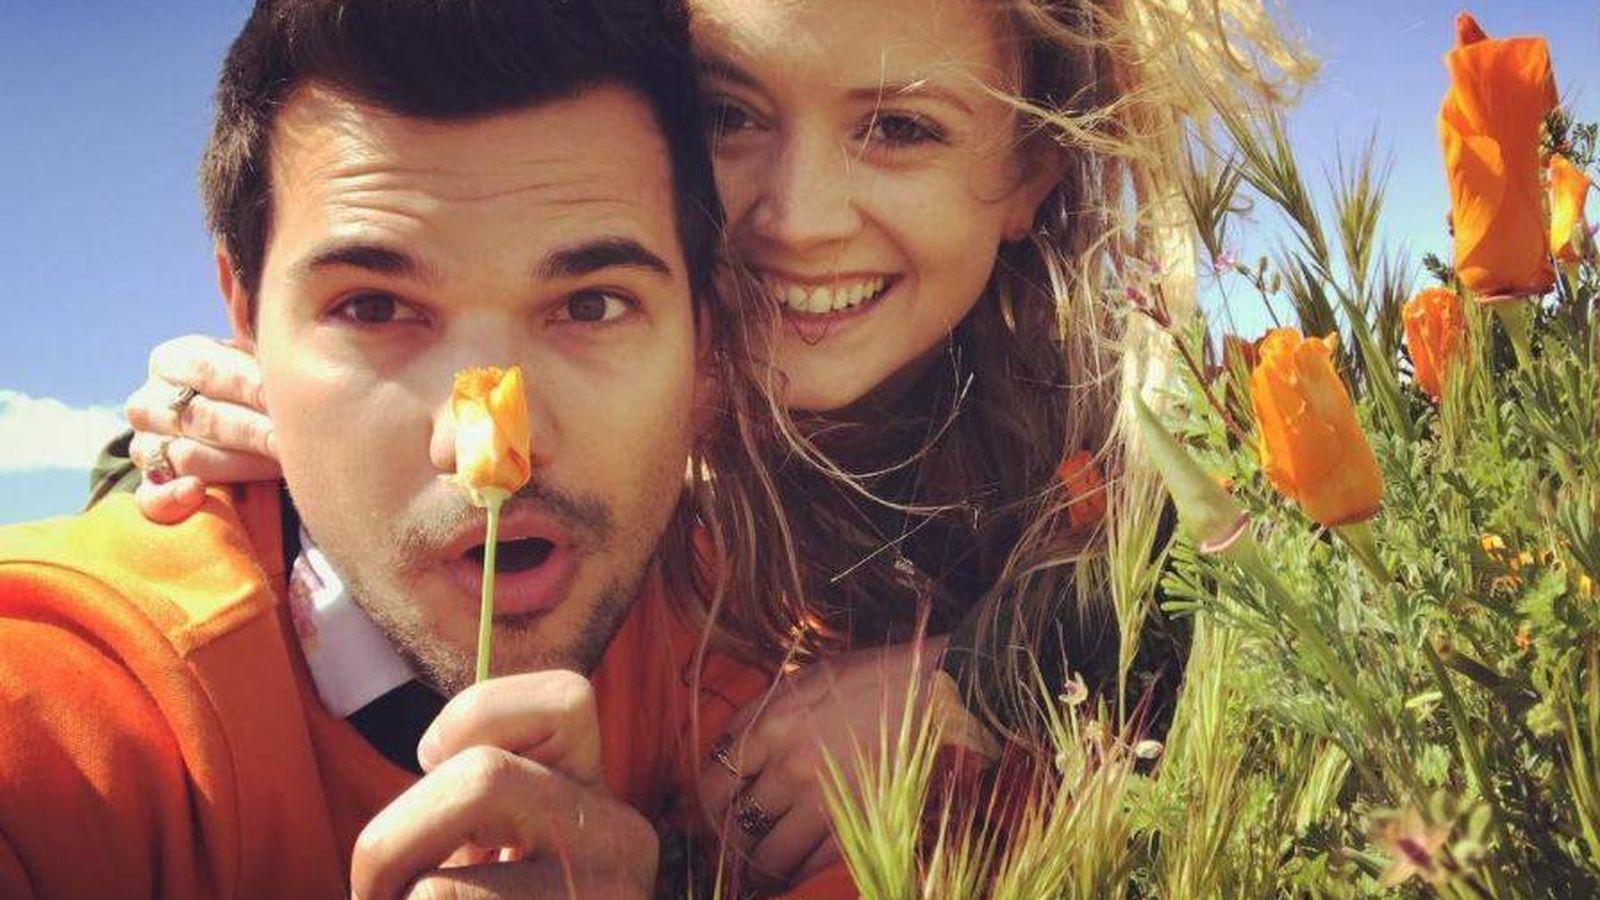 Foto: Taylor Lautner y Billie Lourd en una imagen de Instagram.